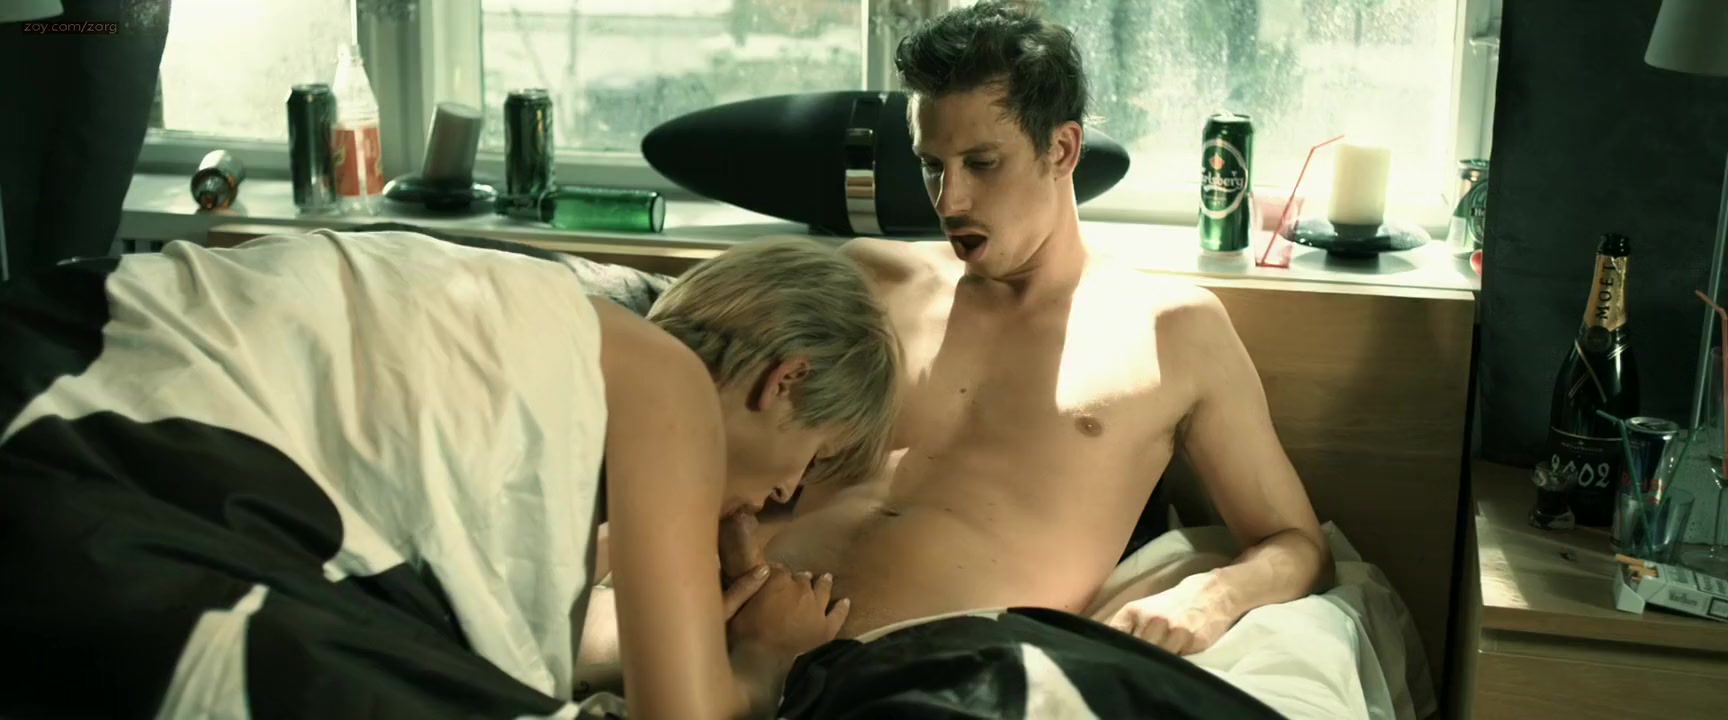 Gitte Witt, Sara Elle & Tina Klafstadbakkenin PornoPung Intense vaginal itching flat sores